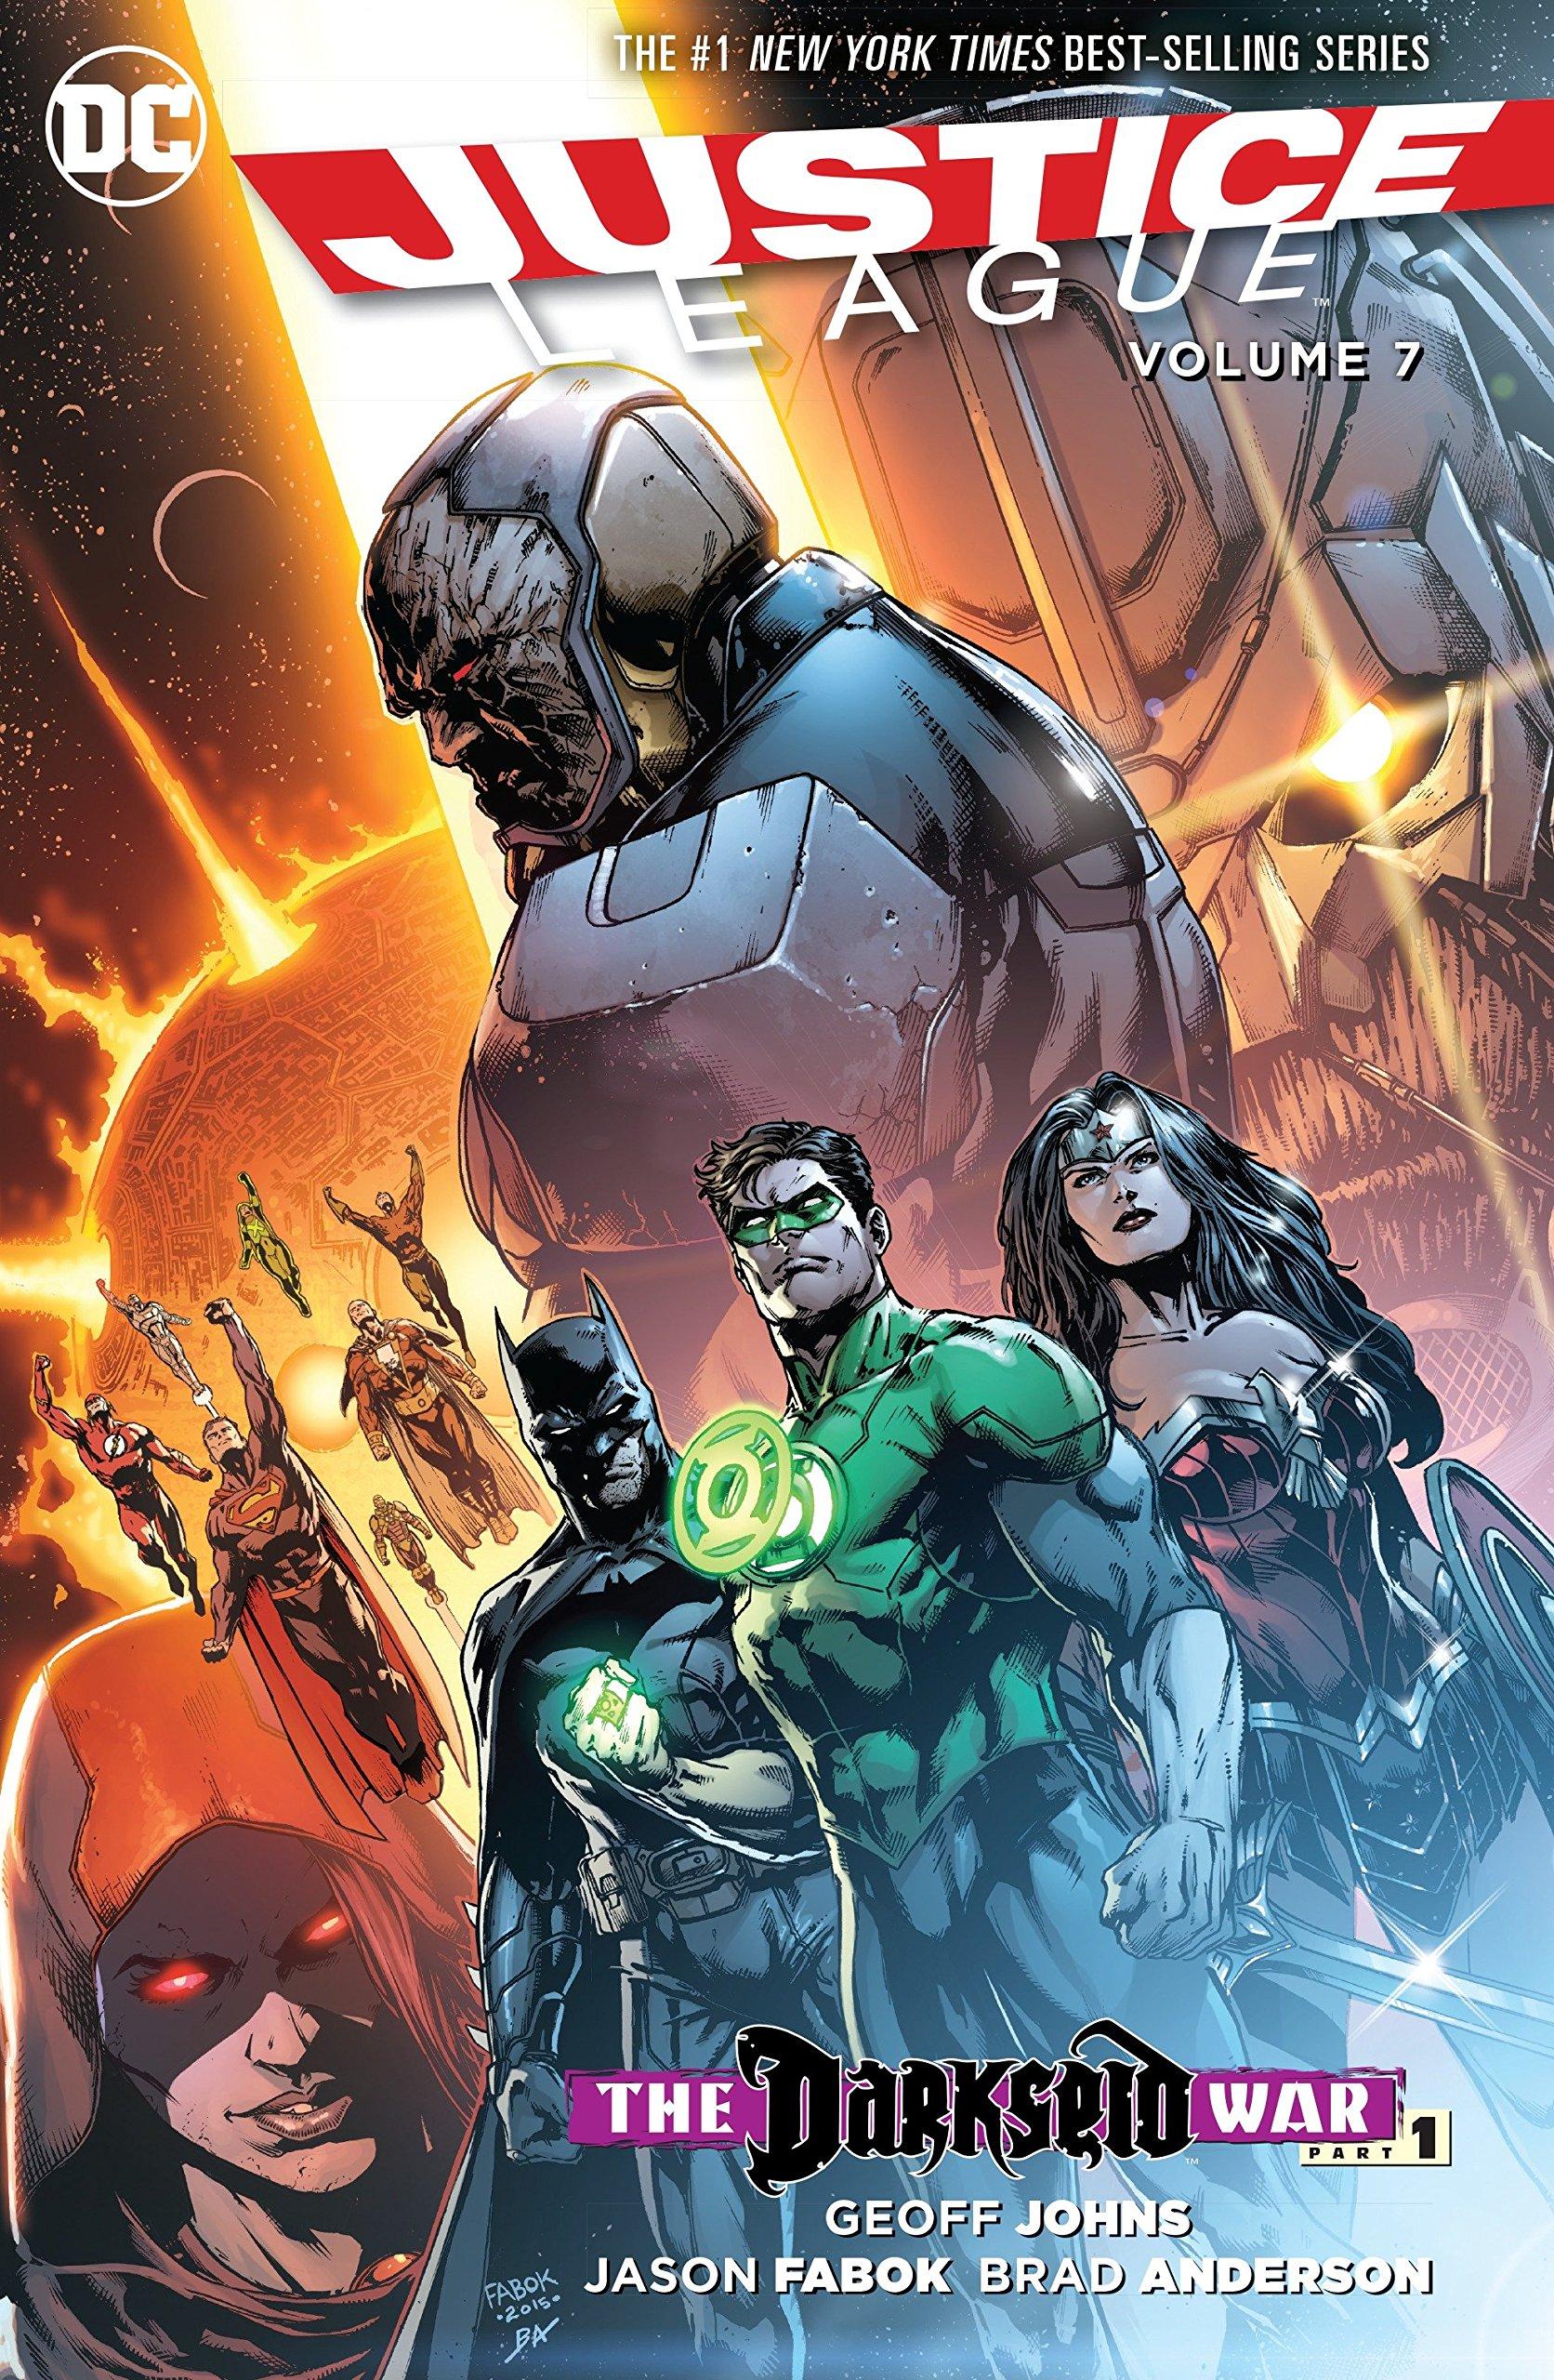 f6ed111e09c6 Buy Justice League Vol. 7  Darkseid War Part 1 Book Online at Low ...